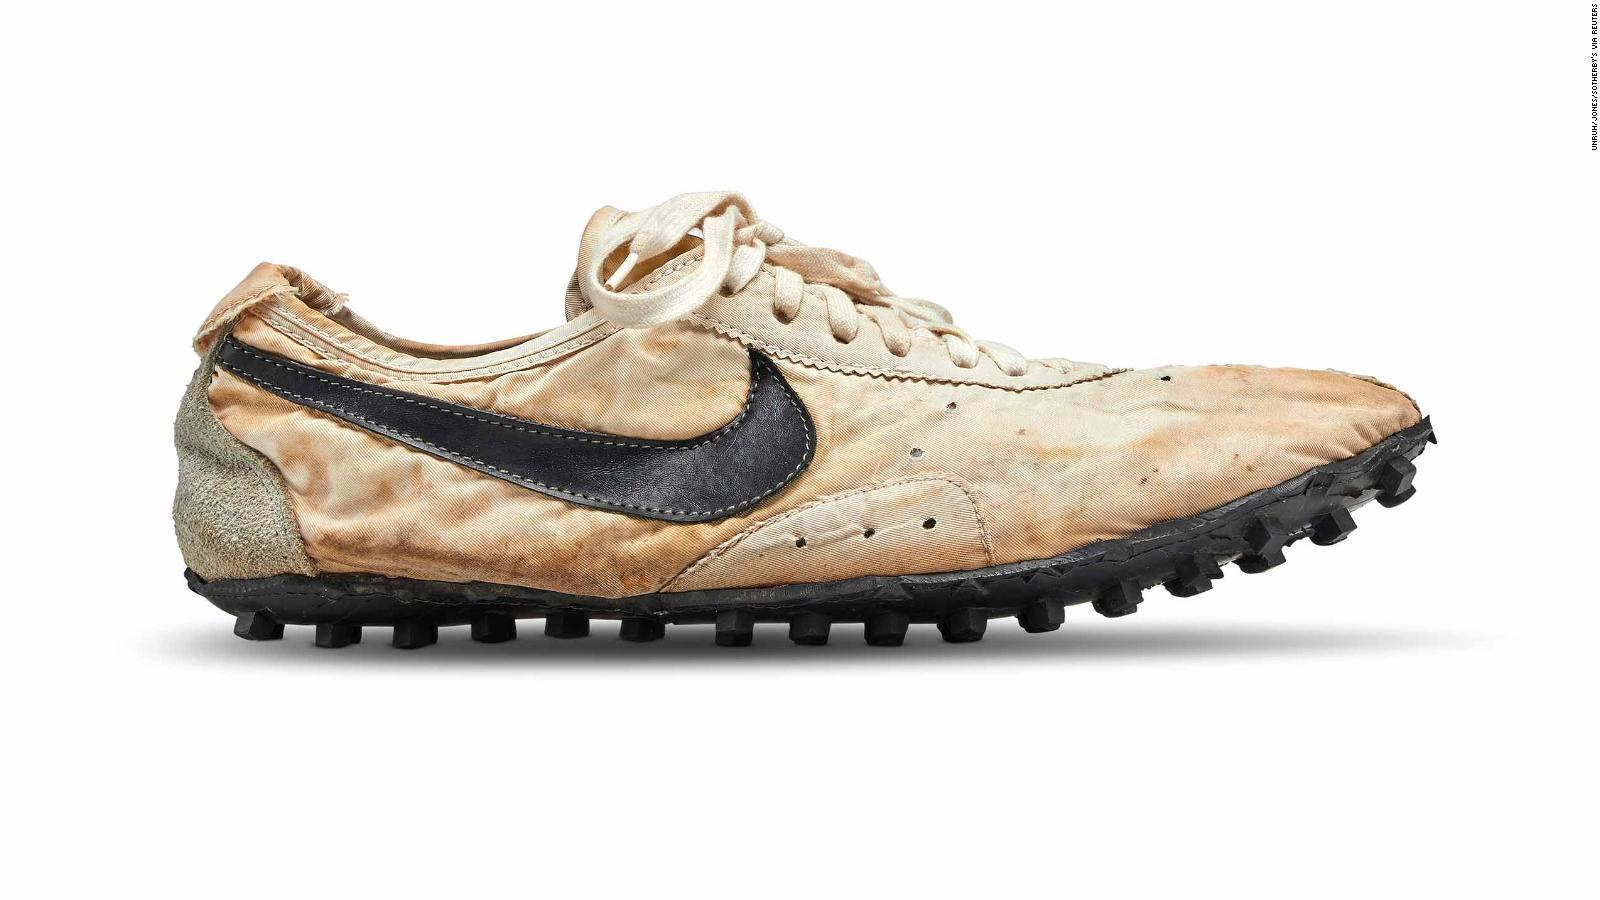 Nike Waffle的原型跑鞋